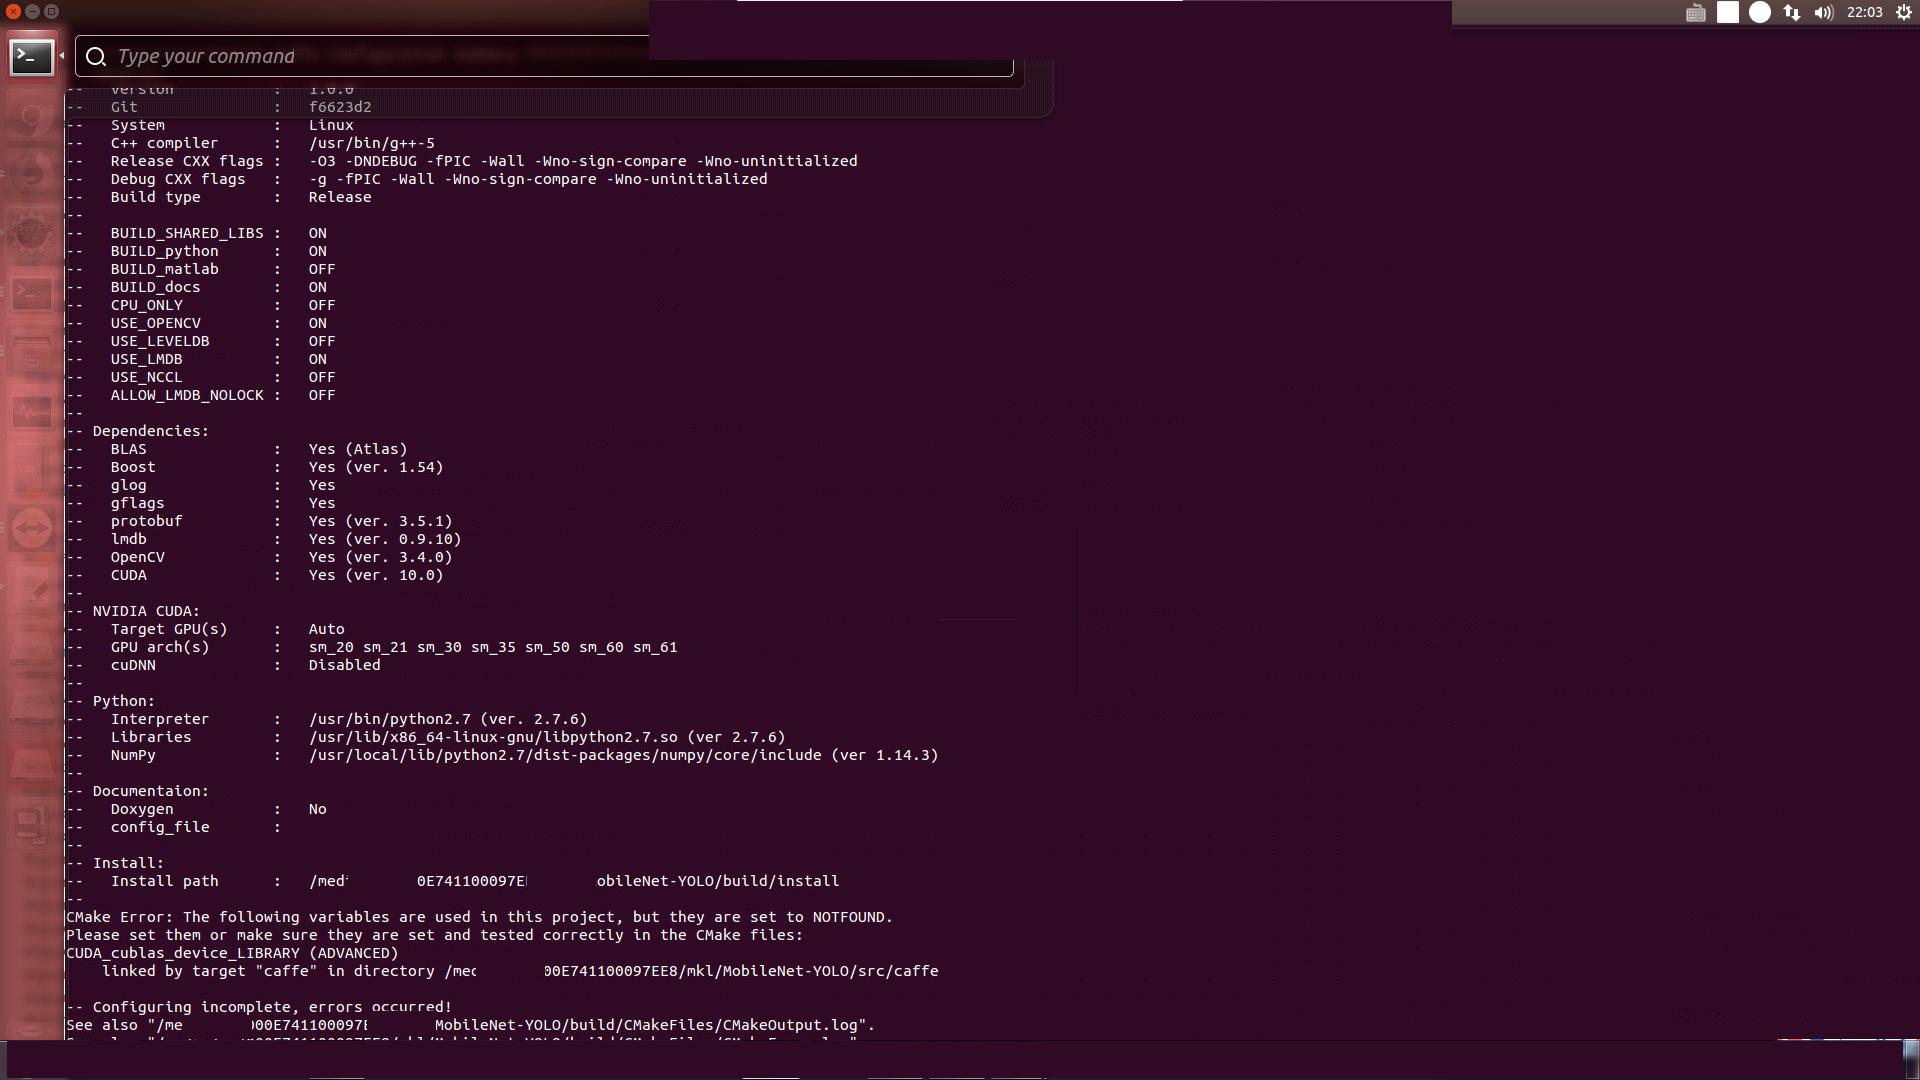 cmake error · Issue #48 · eric612/MobileNet-YOLO · GitHub